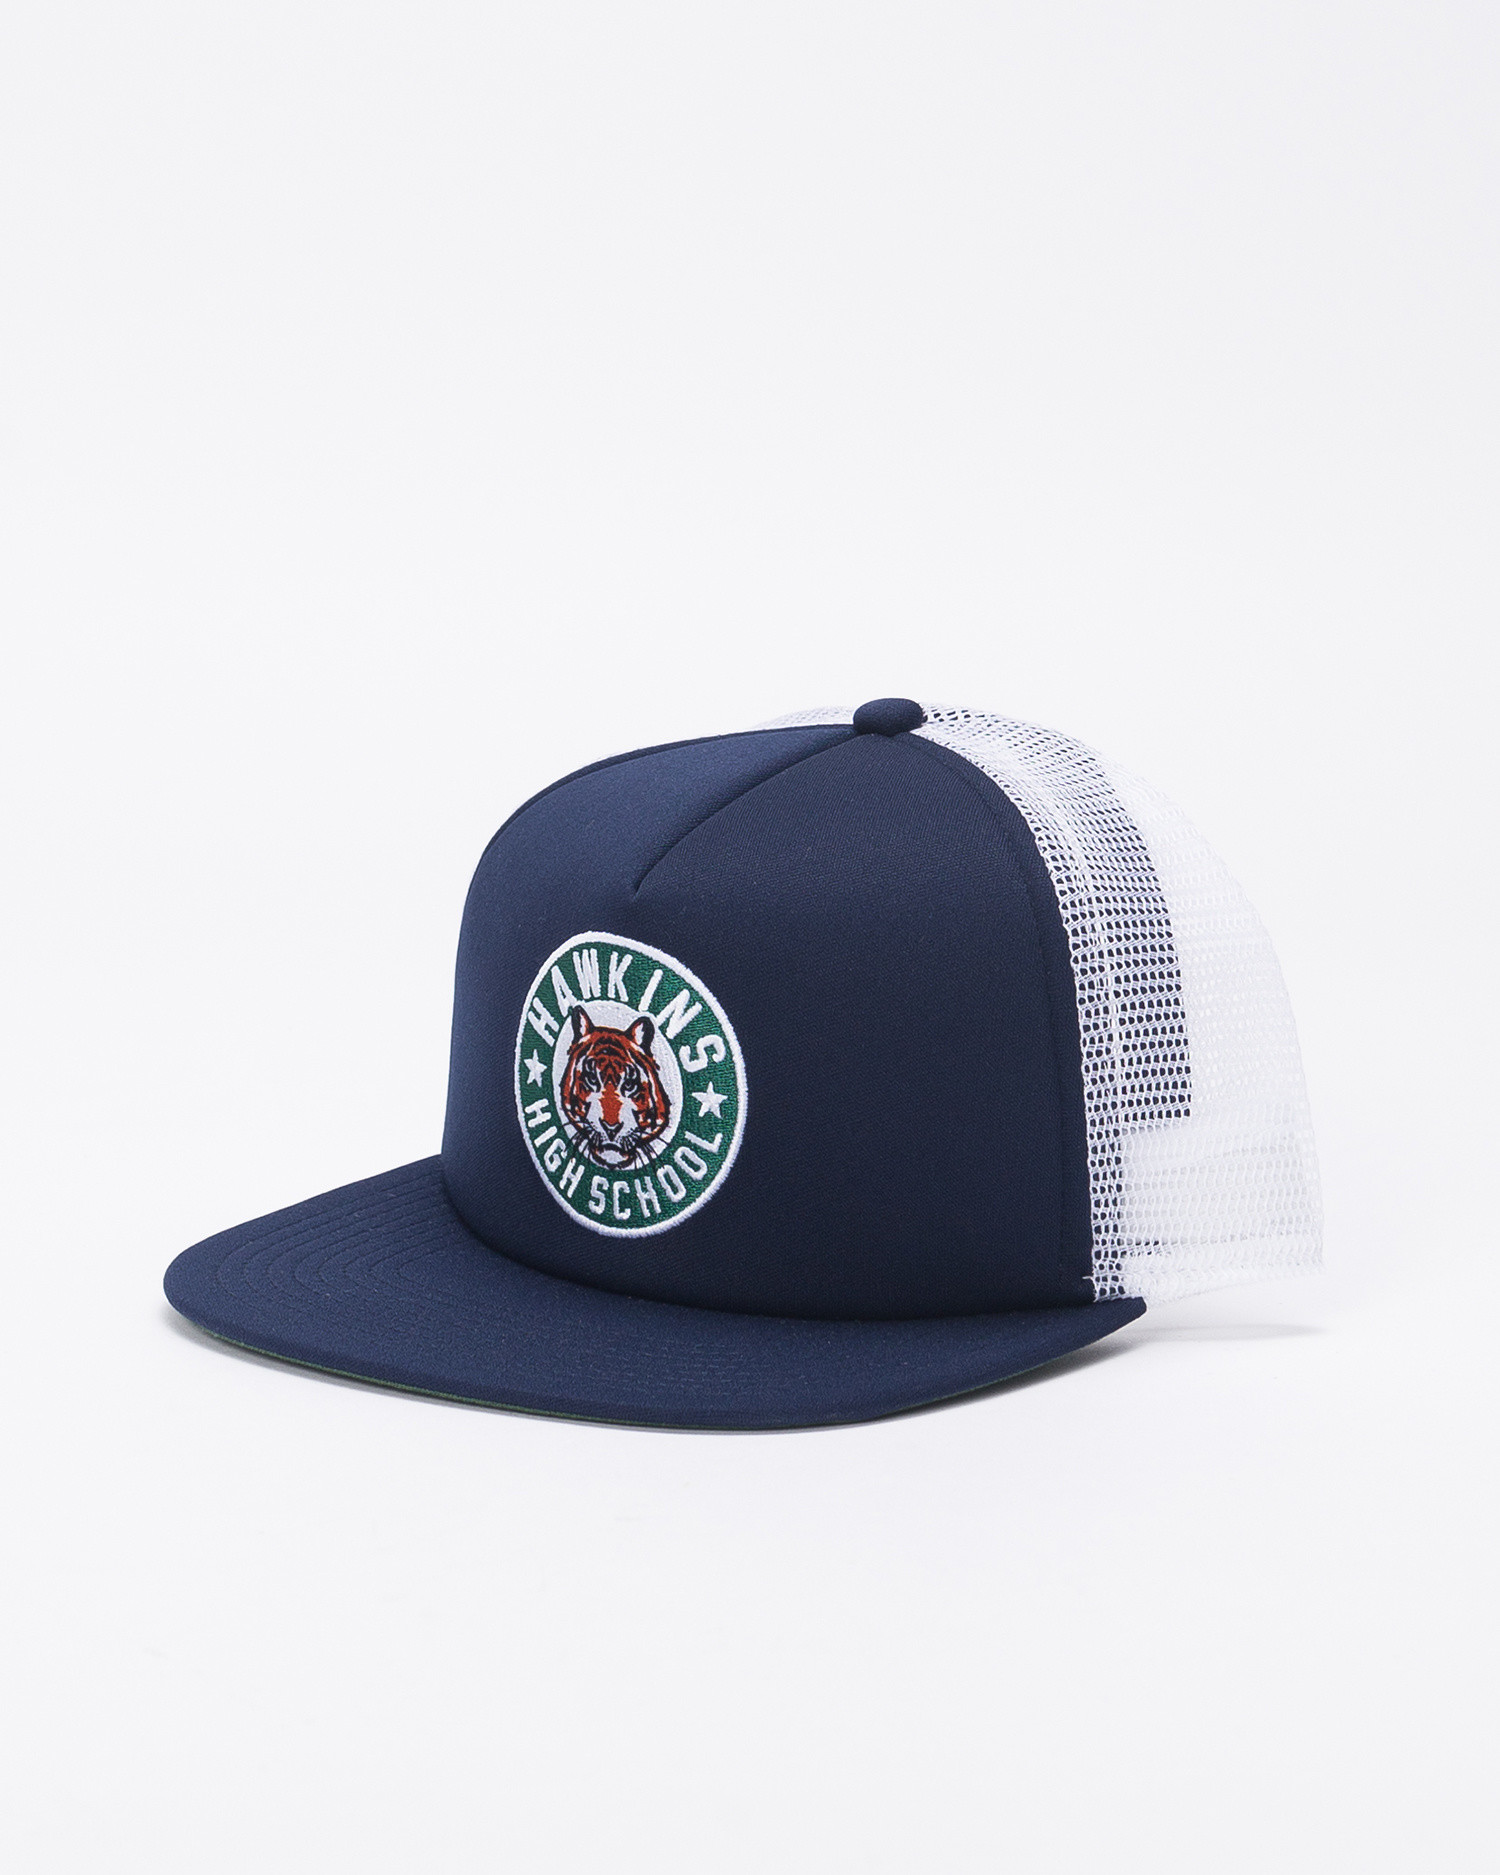 Nike Stranger Things Cap Blue